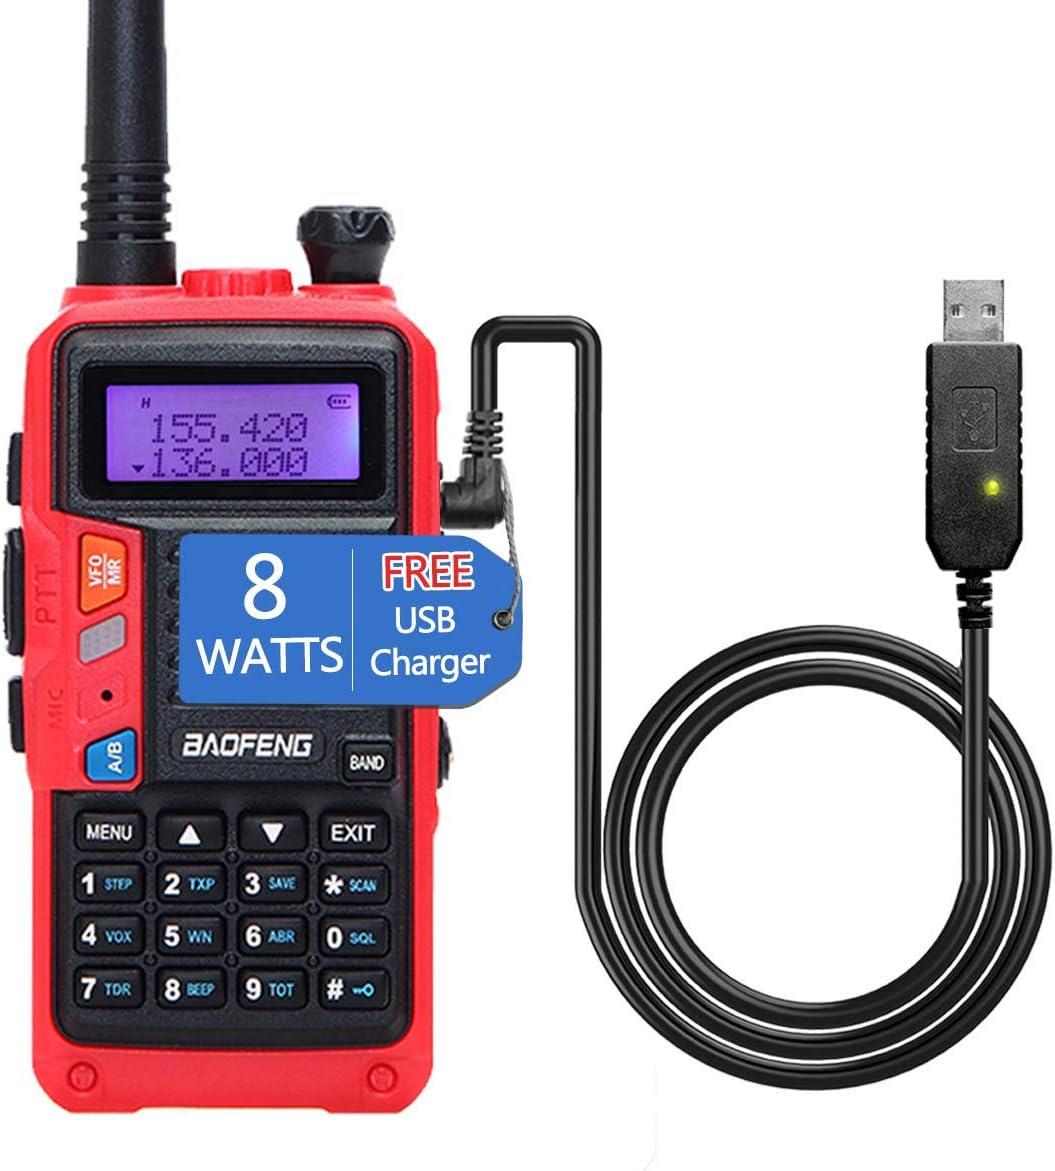 Popular brand AiritonBAOFENG UV-S9 Plus Max 43% OFF 8W 4W Ham Radio 1W Handheld Portable